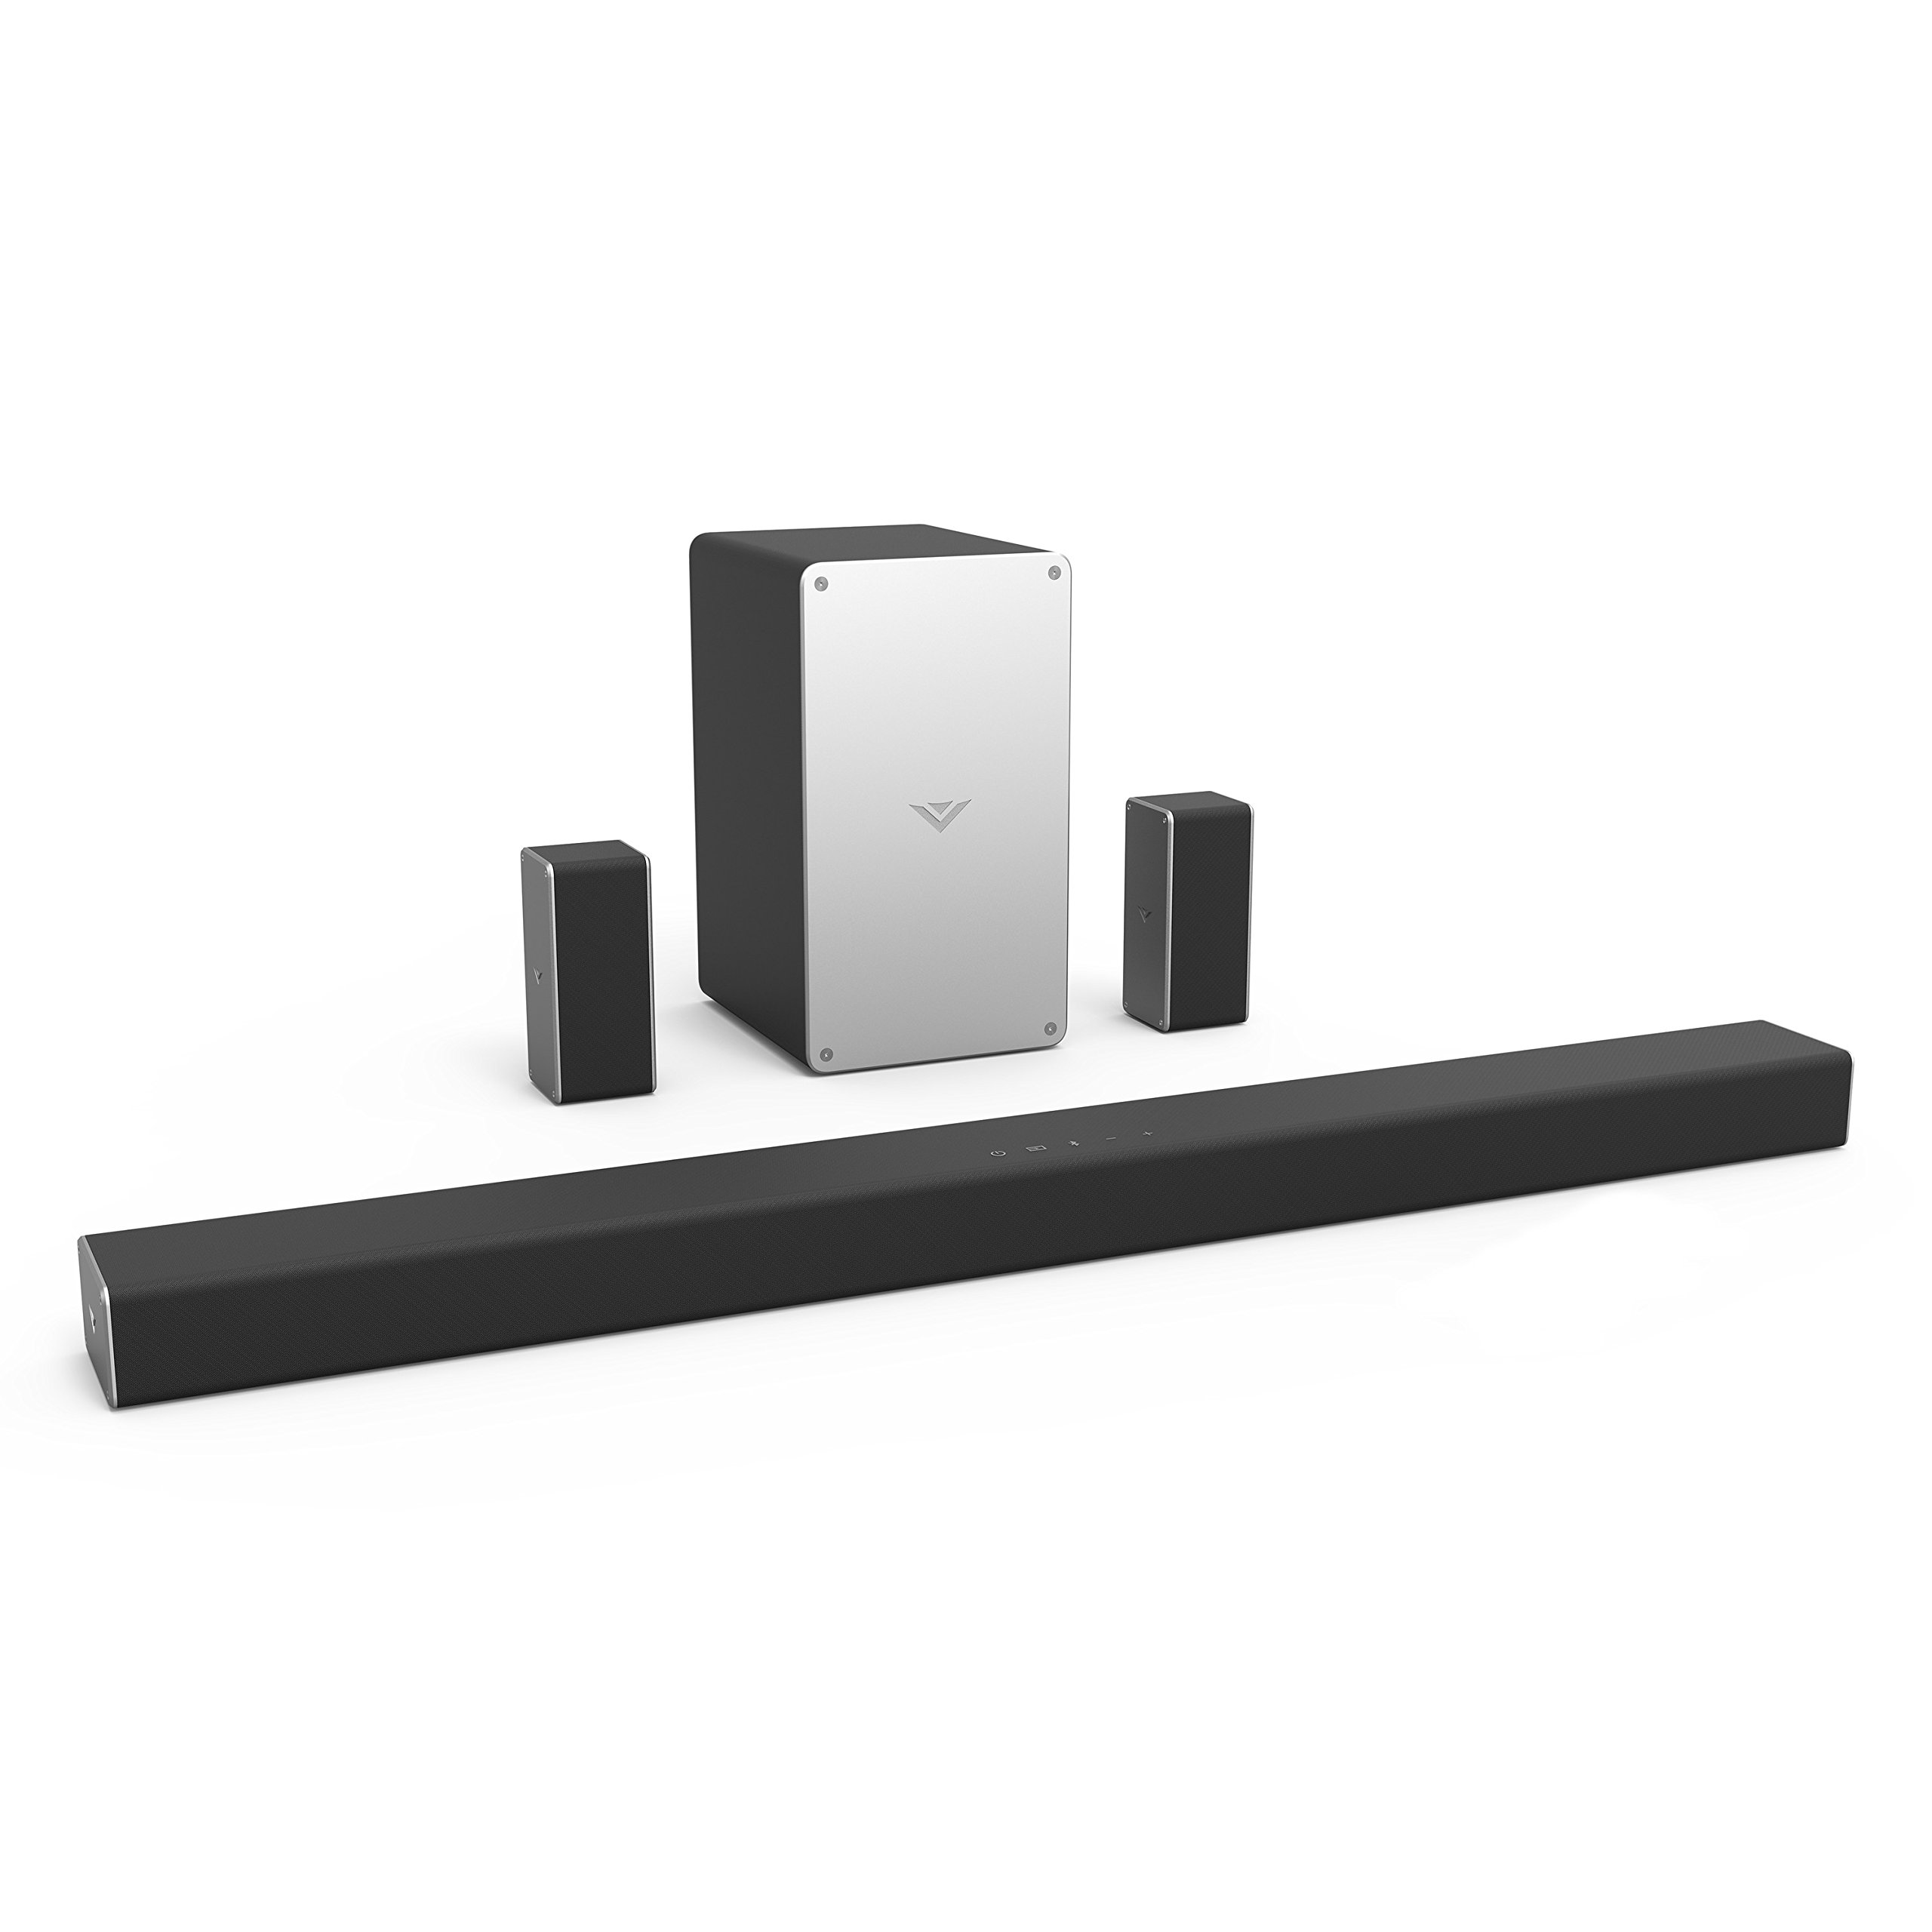 VIZIO SB3651-F6 36'' 5.1 Home Theater Sound Bar System, Black